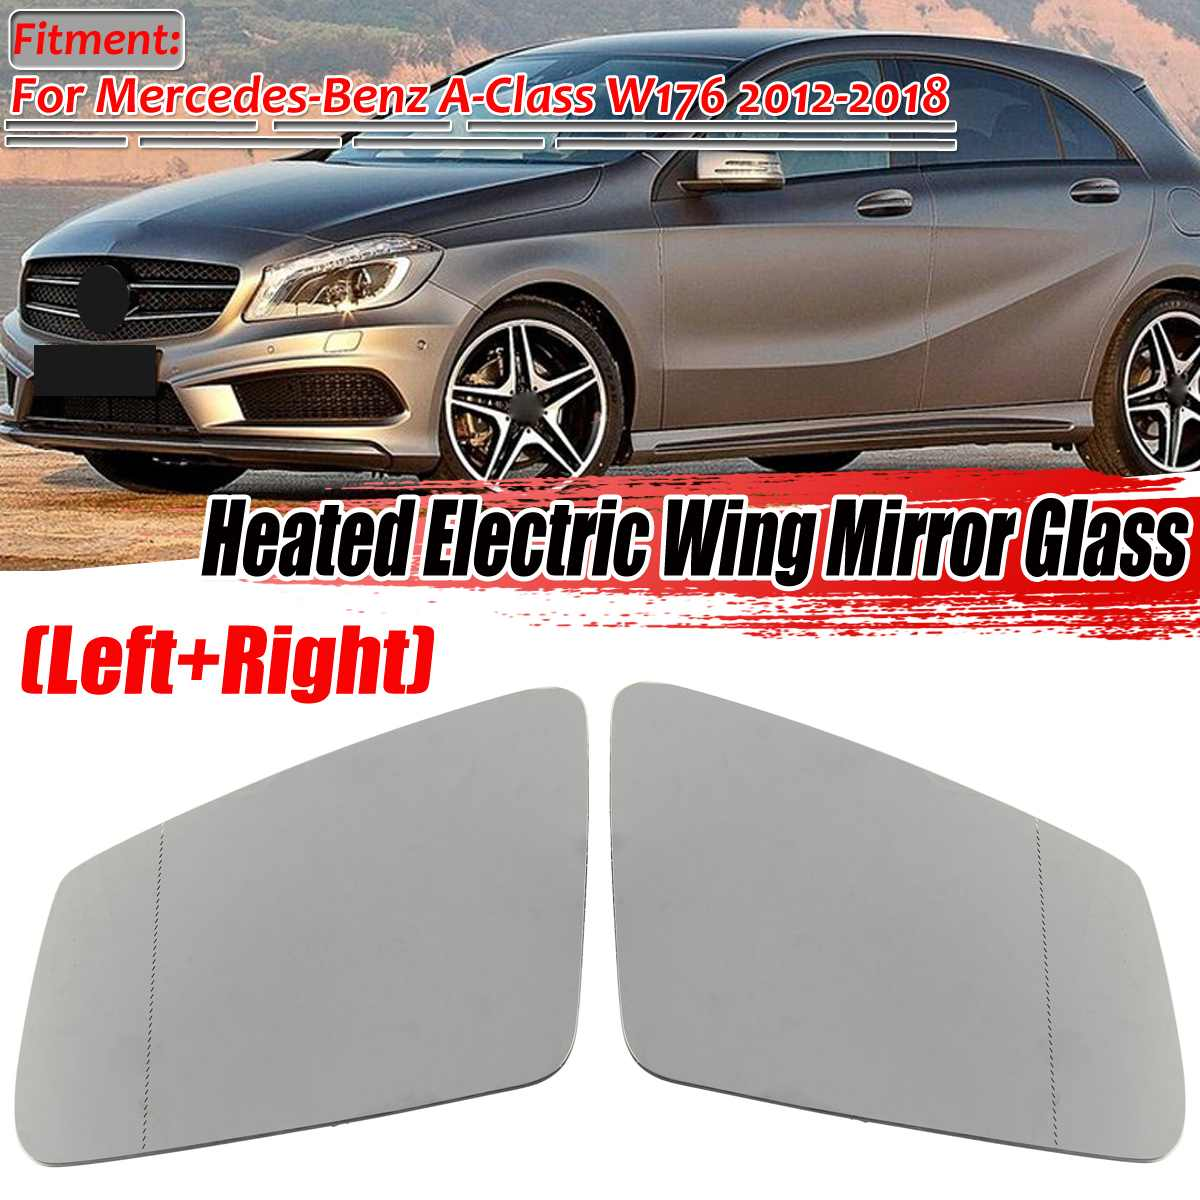 W176 espejo de ala lateral de coche de cristal de espejo de ala eléctrica calentado para Mercedes para Benz Clase A W176 2012-2018